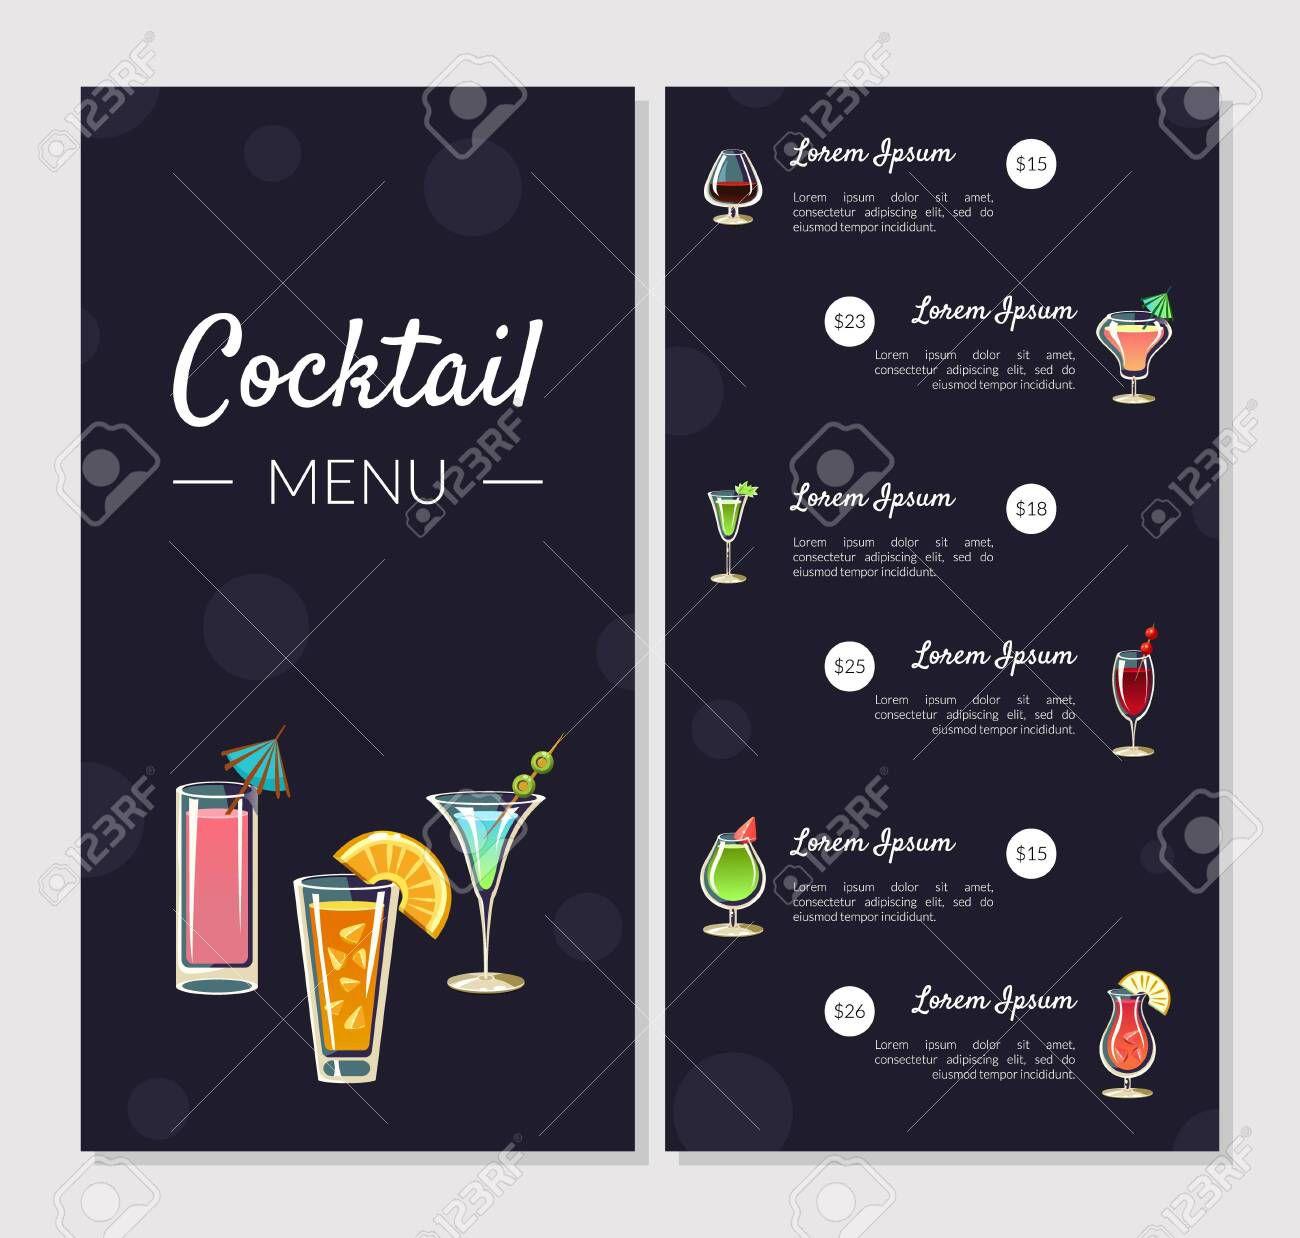 003 Shocking Bar Menu Template Free Concept  Download SnackFull